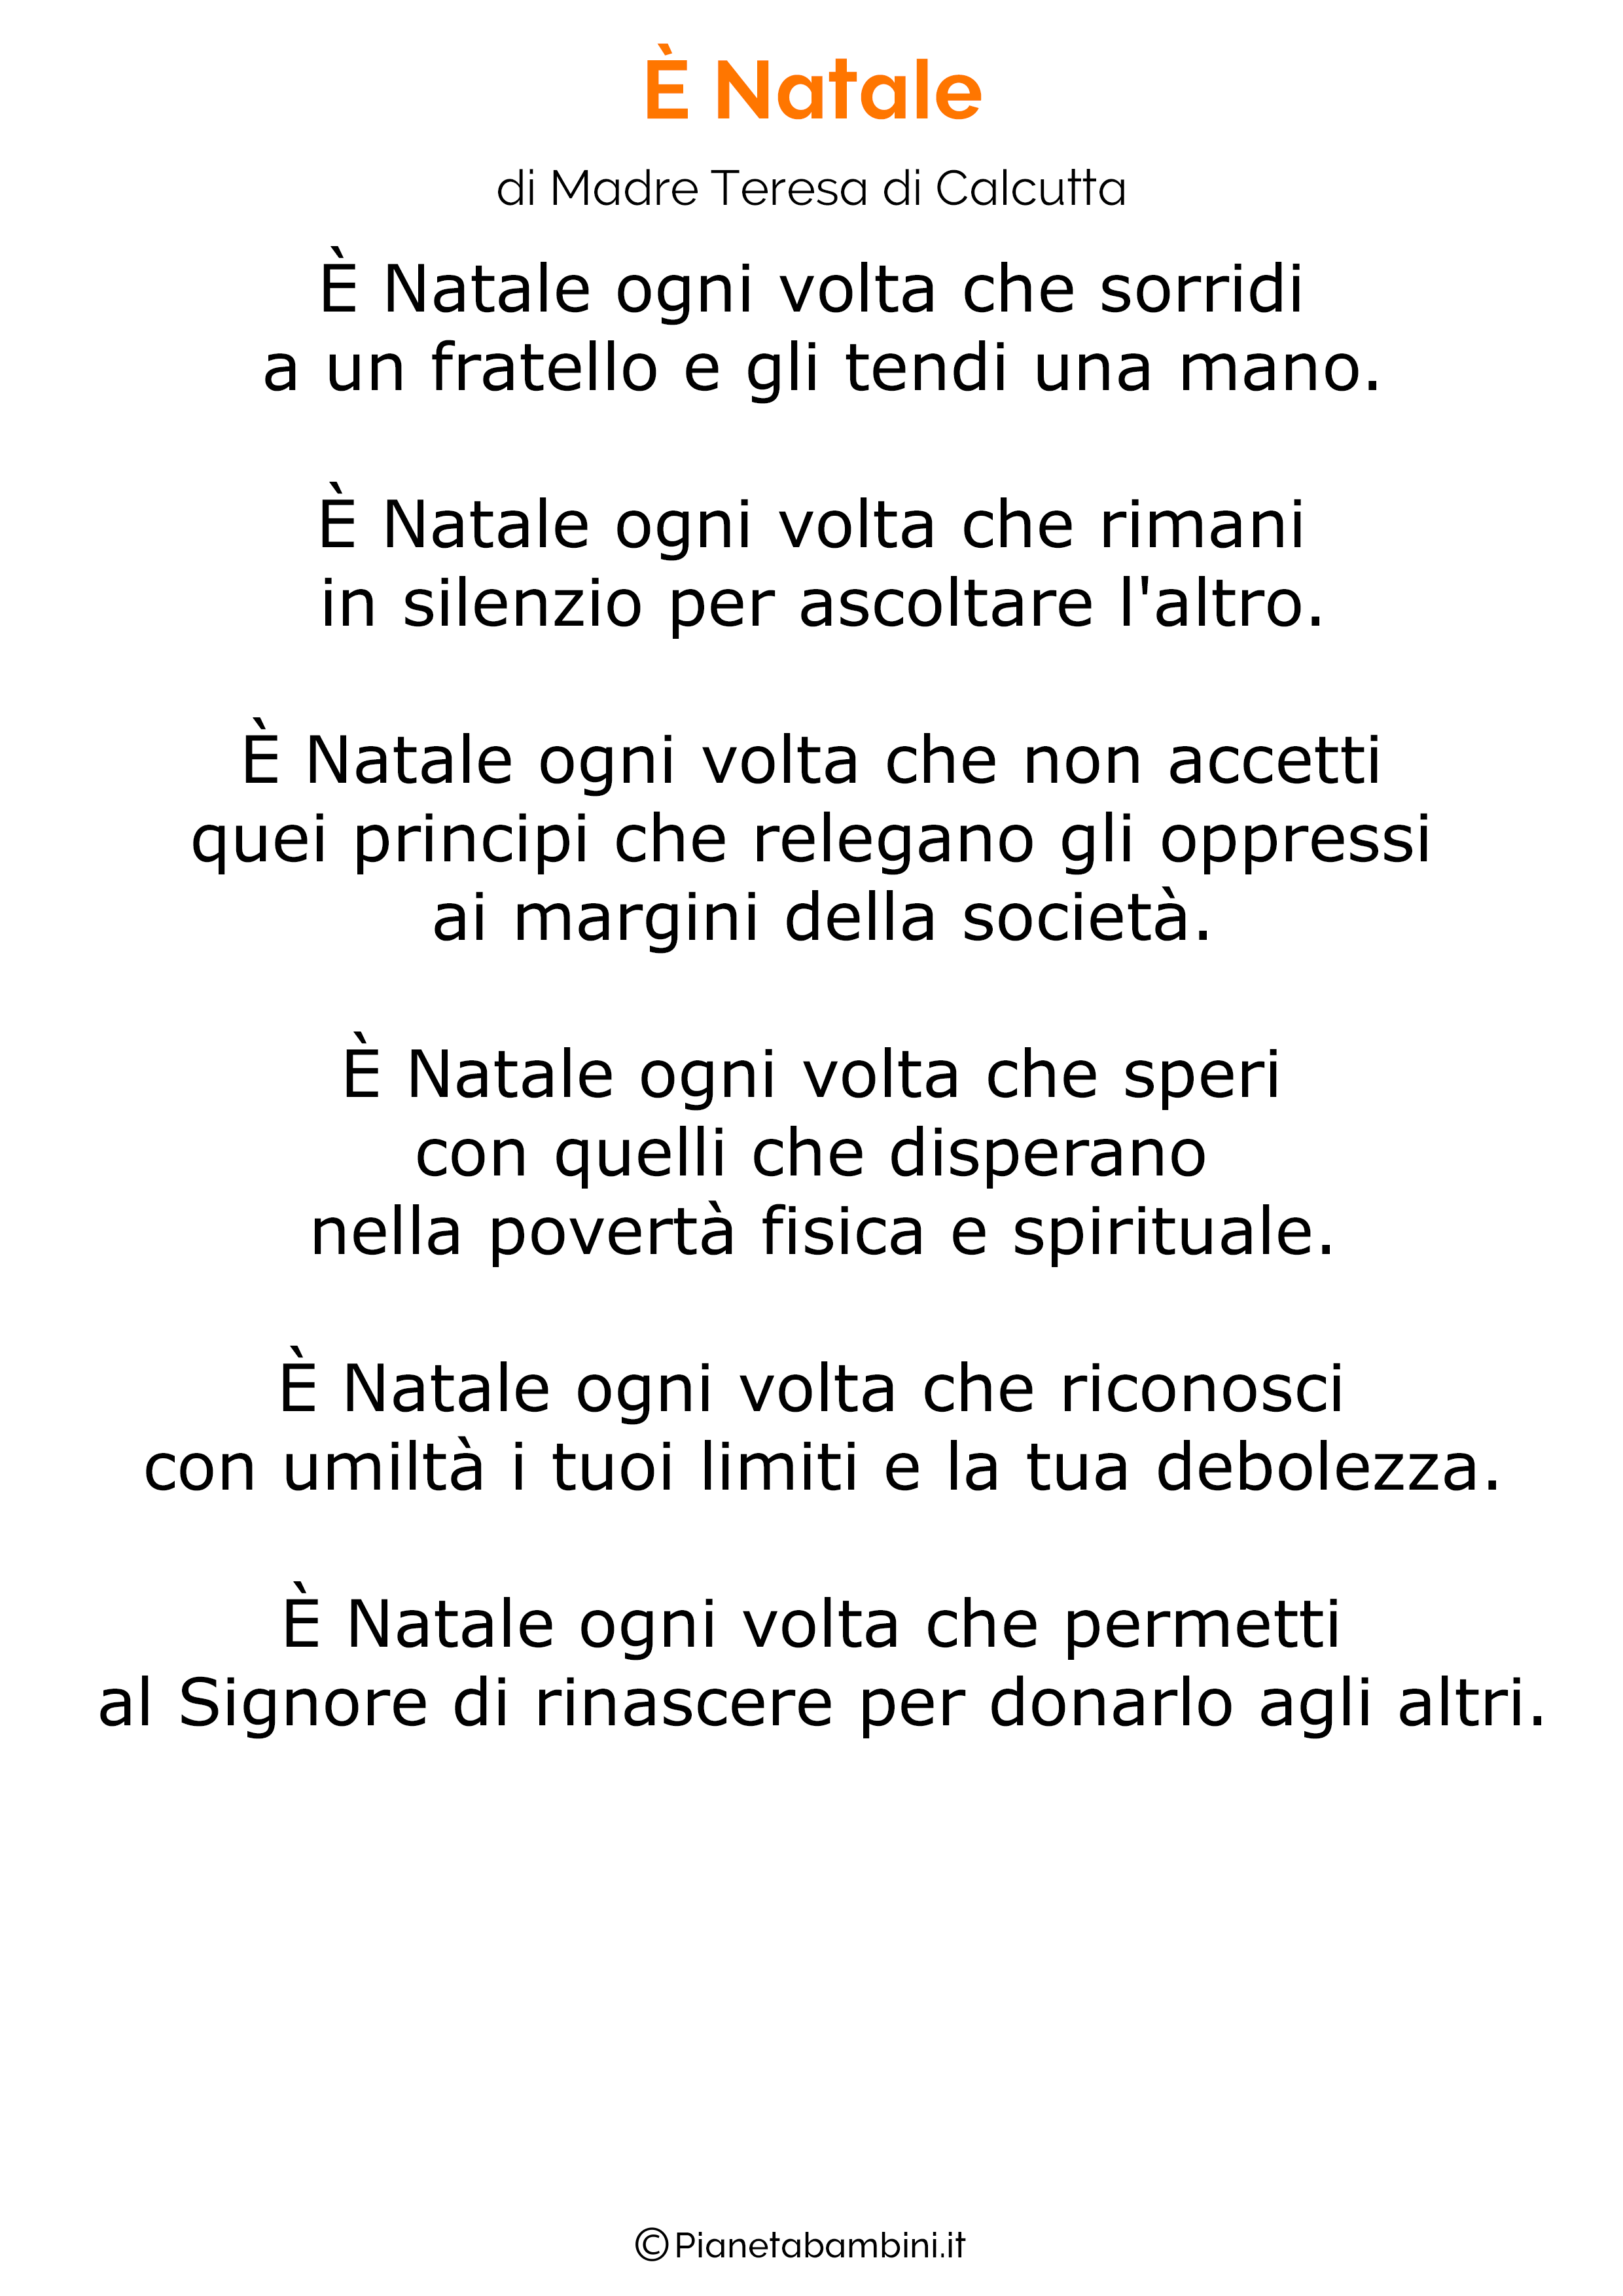 Poesia di Natale autori classici 08